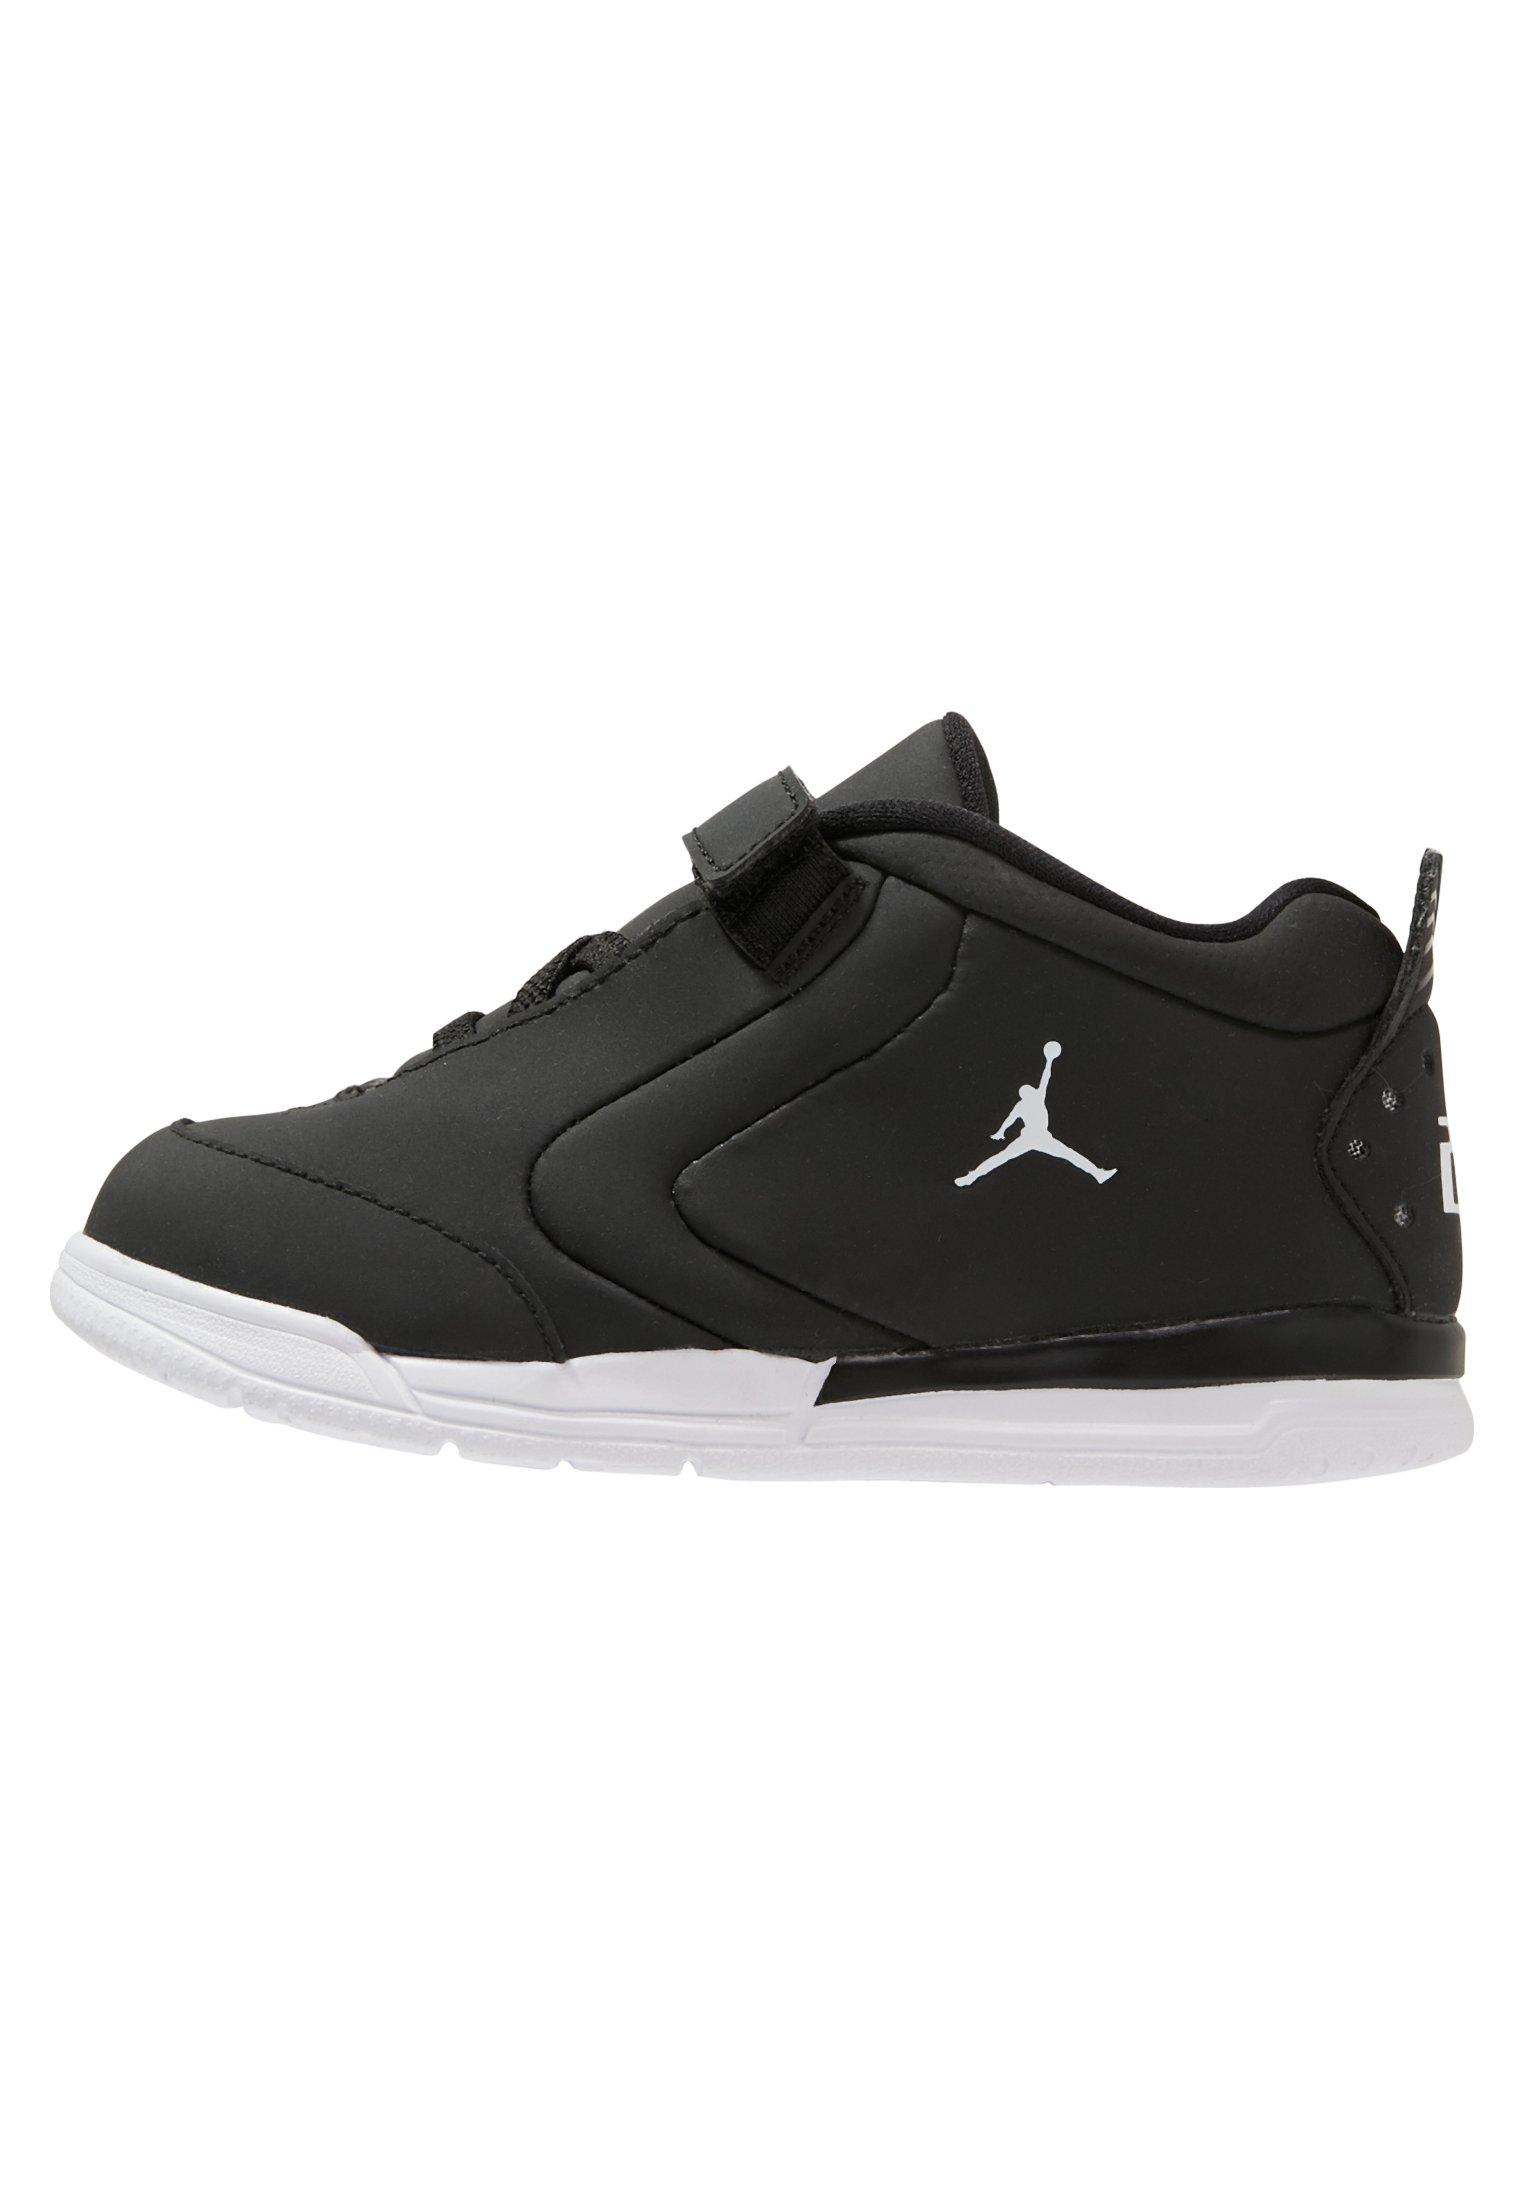 Jordan BIG FUND - Baby shoes - black